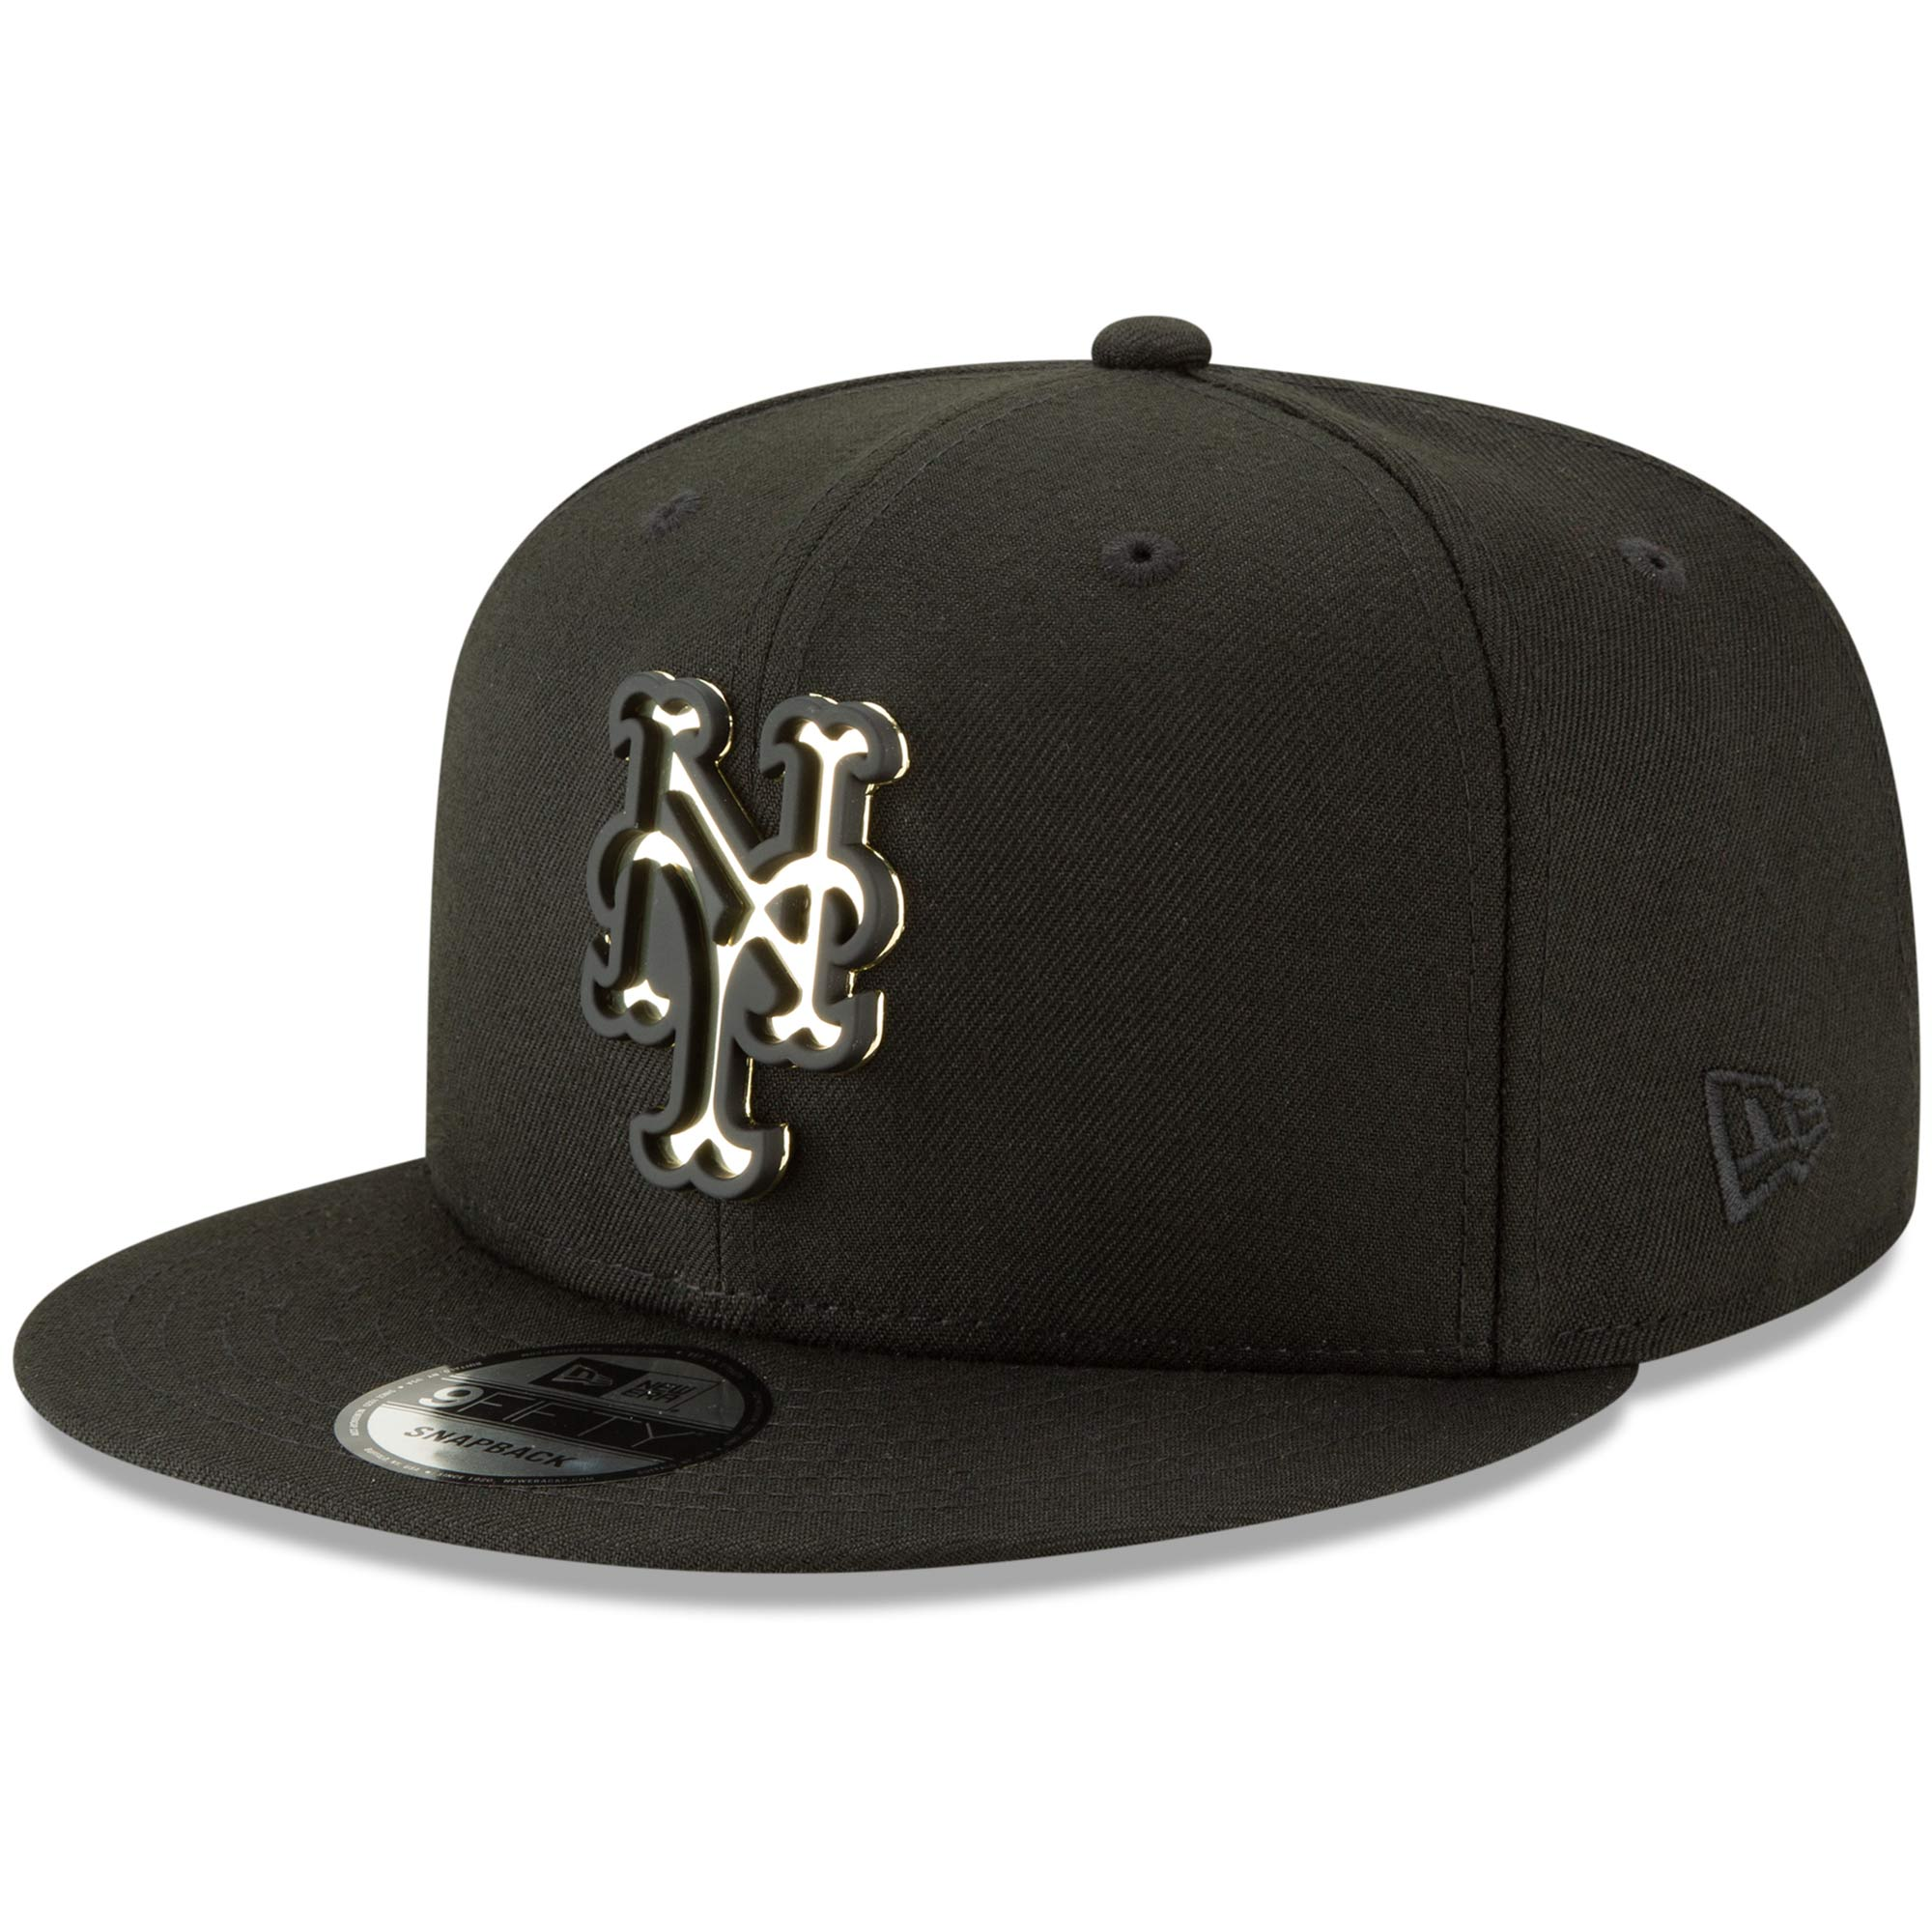 New York Mets New Era Metal Stack 9FIFTY Adjustable Hat - Black - OSFA